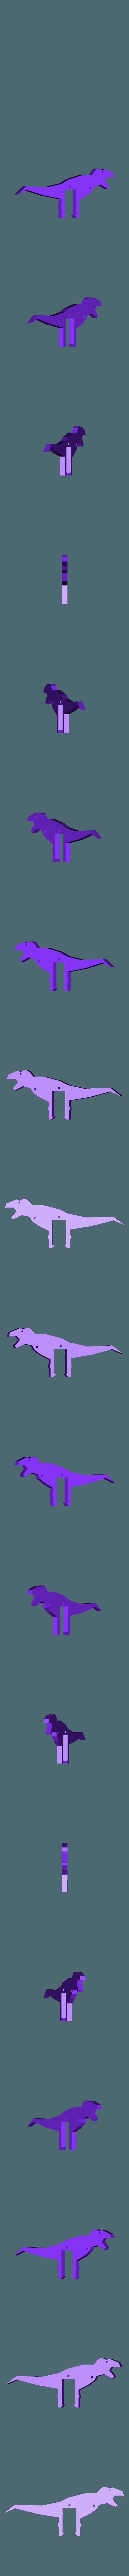 Body.stl Download free STL file T-Rex Windup Walker • 3D printer model, gzumwalt